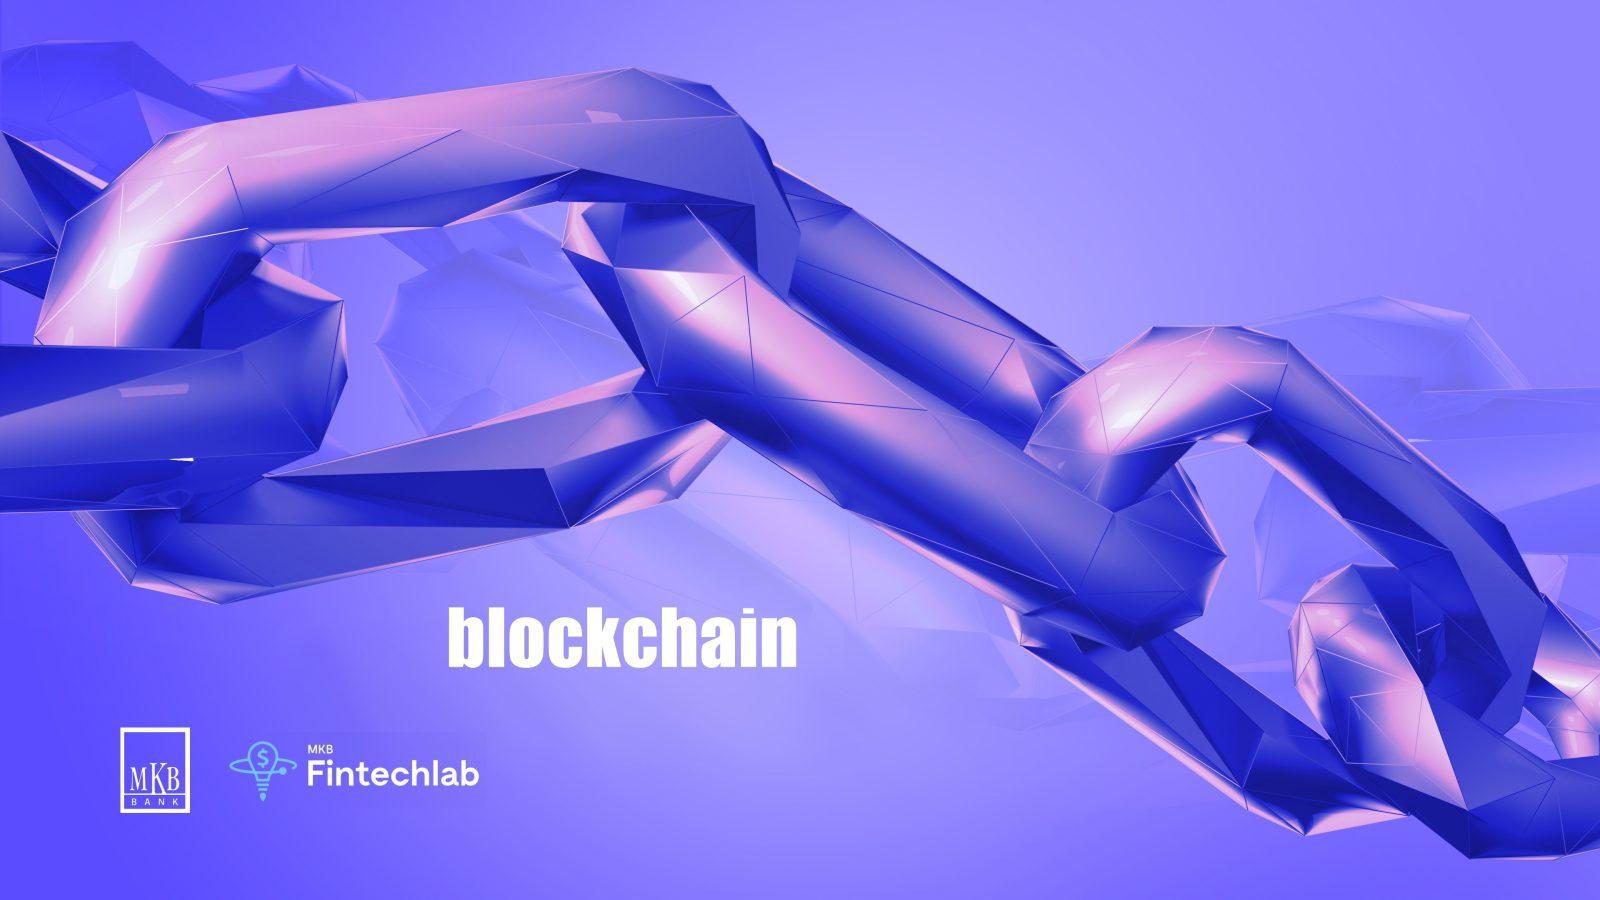 Fintech Akadémia blockchain